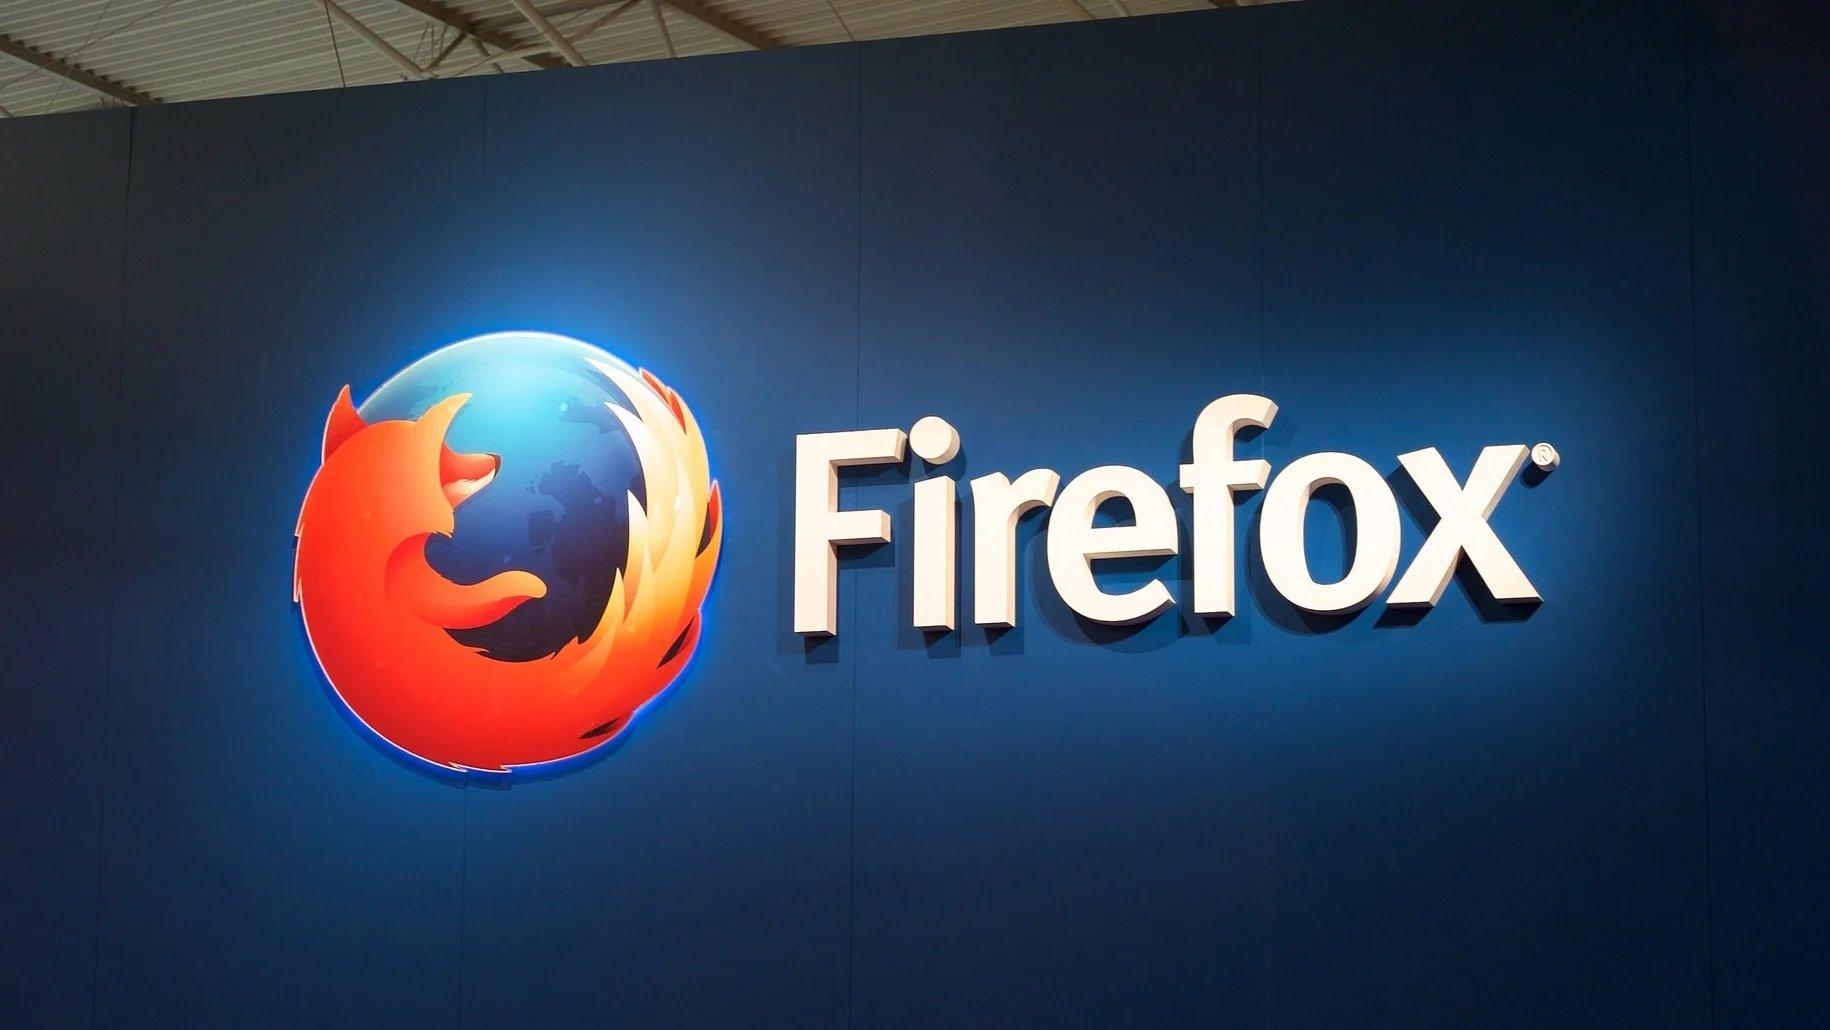 Firefox logo parede